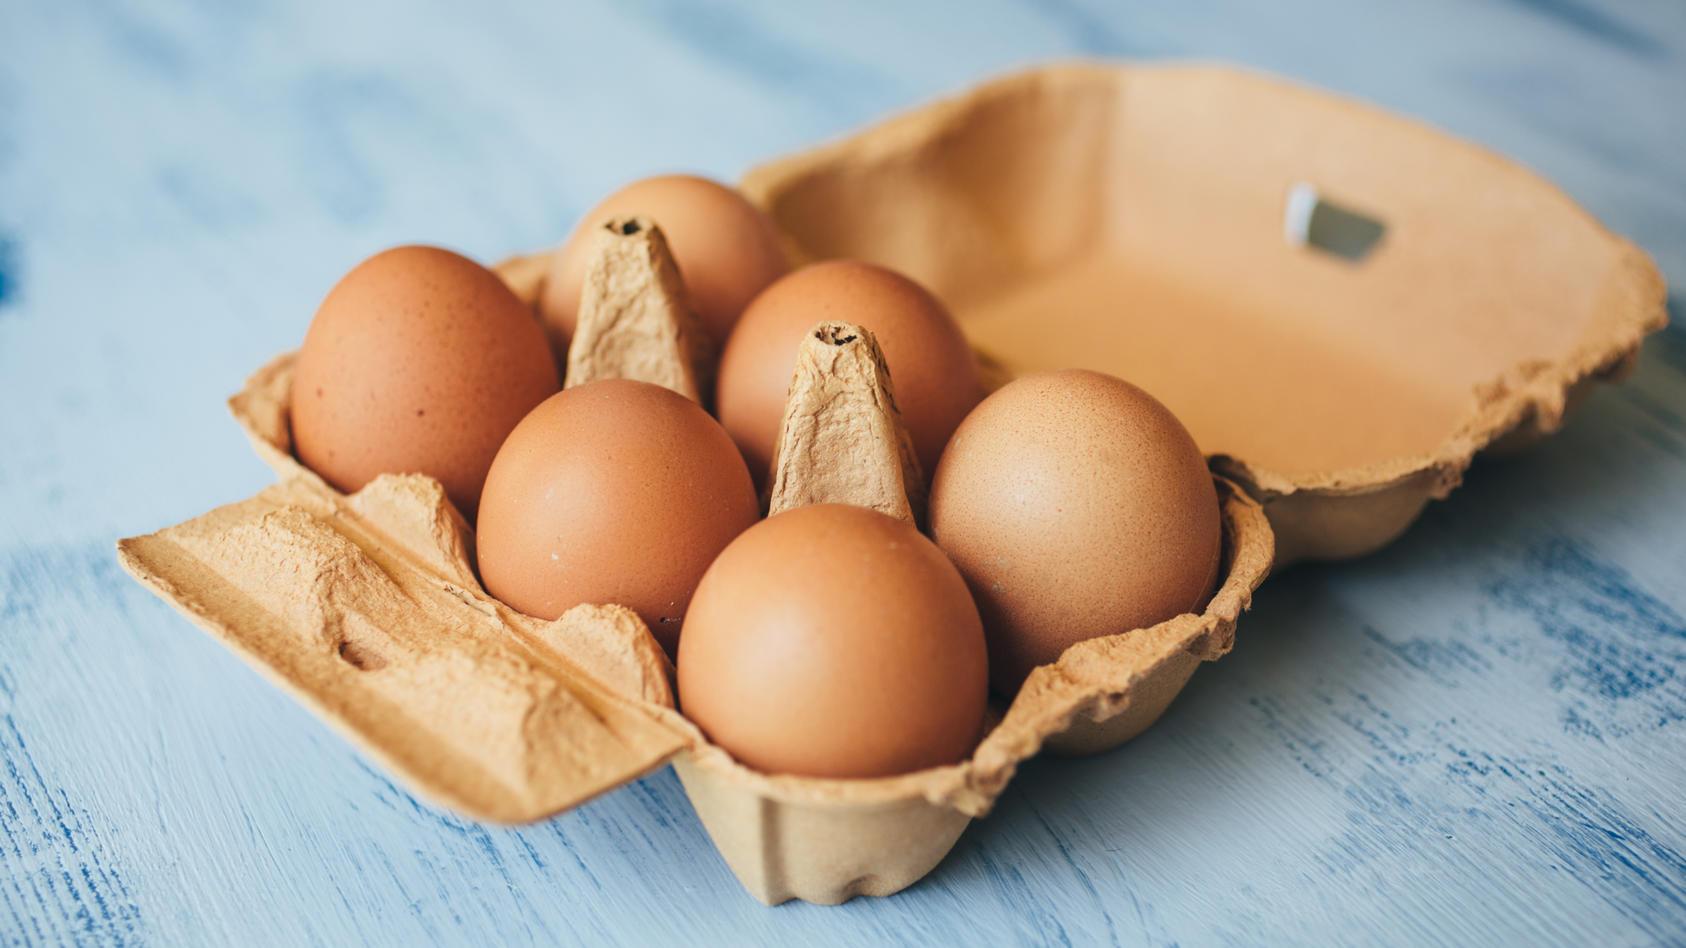 Eierkartons Wiederverwenden